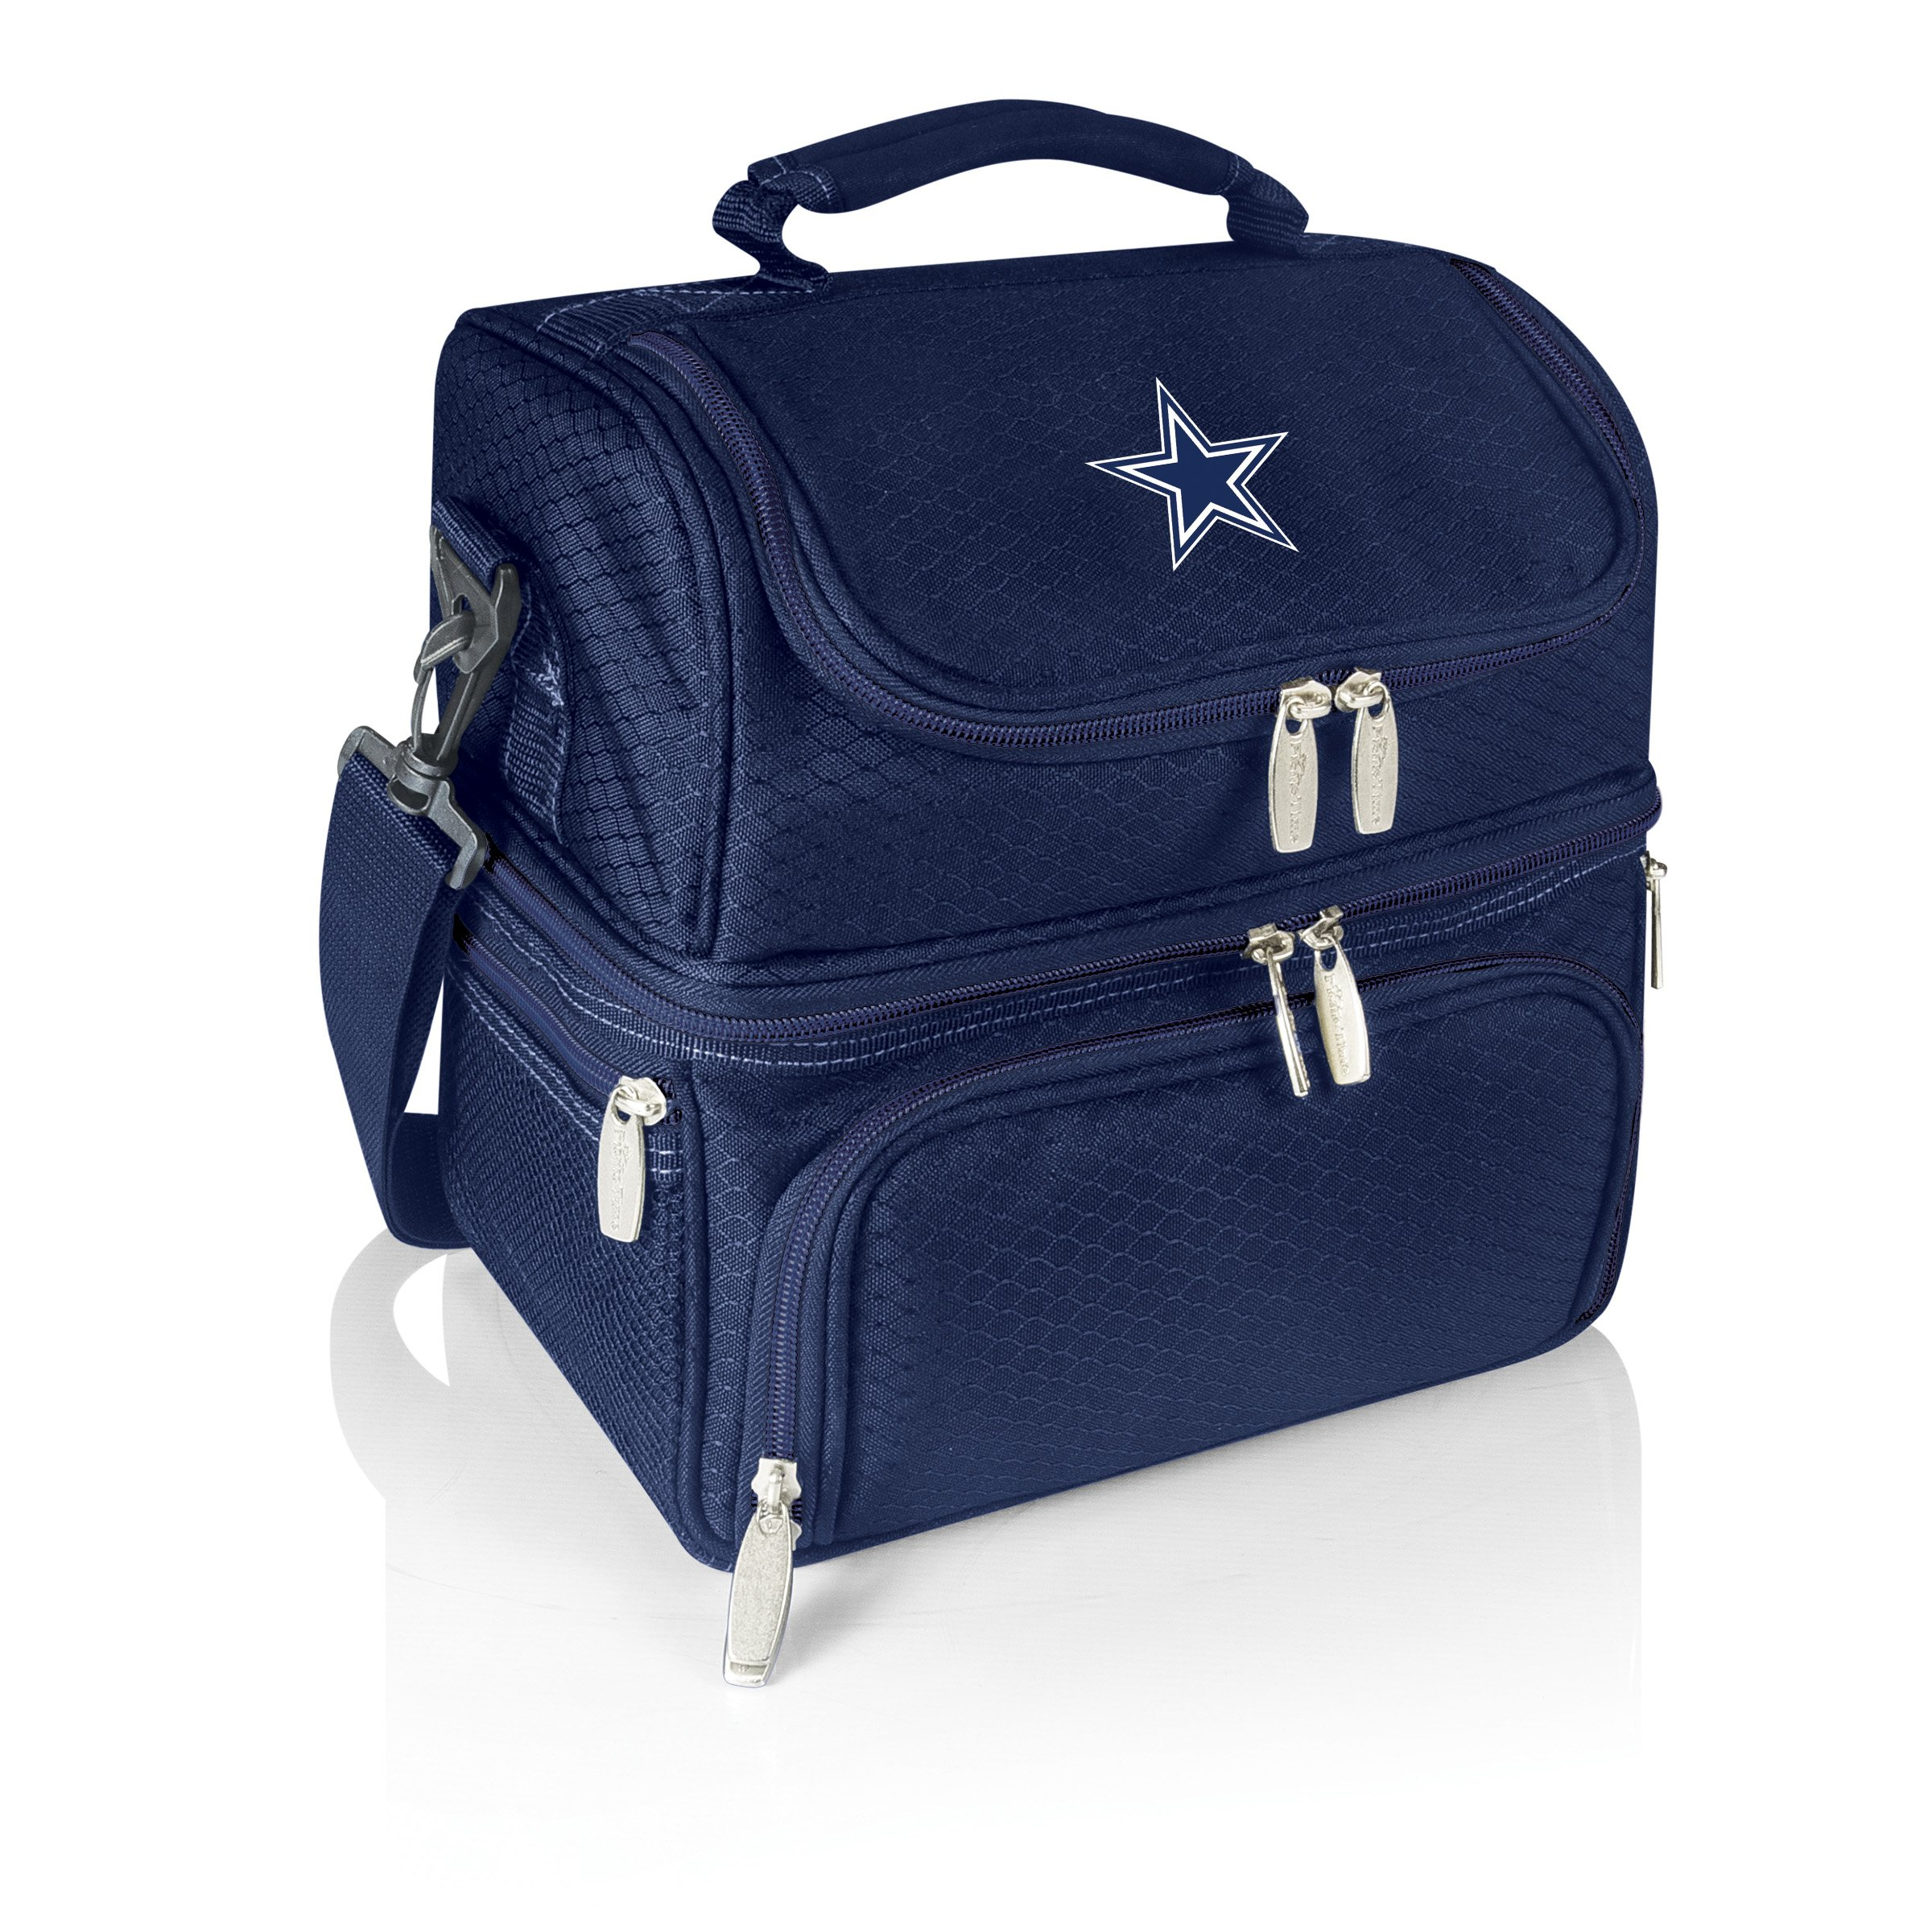 PICNIC TIME NFL Dallas Cowboys Digital Print Pranzo Personal Cooler, One Size, Navy